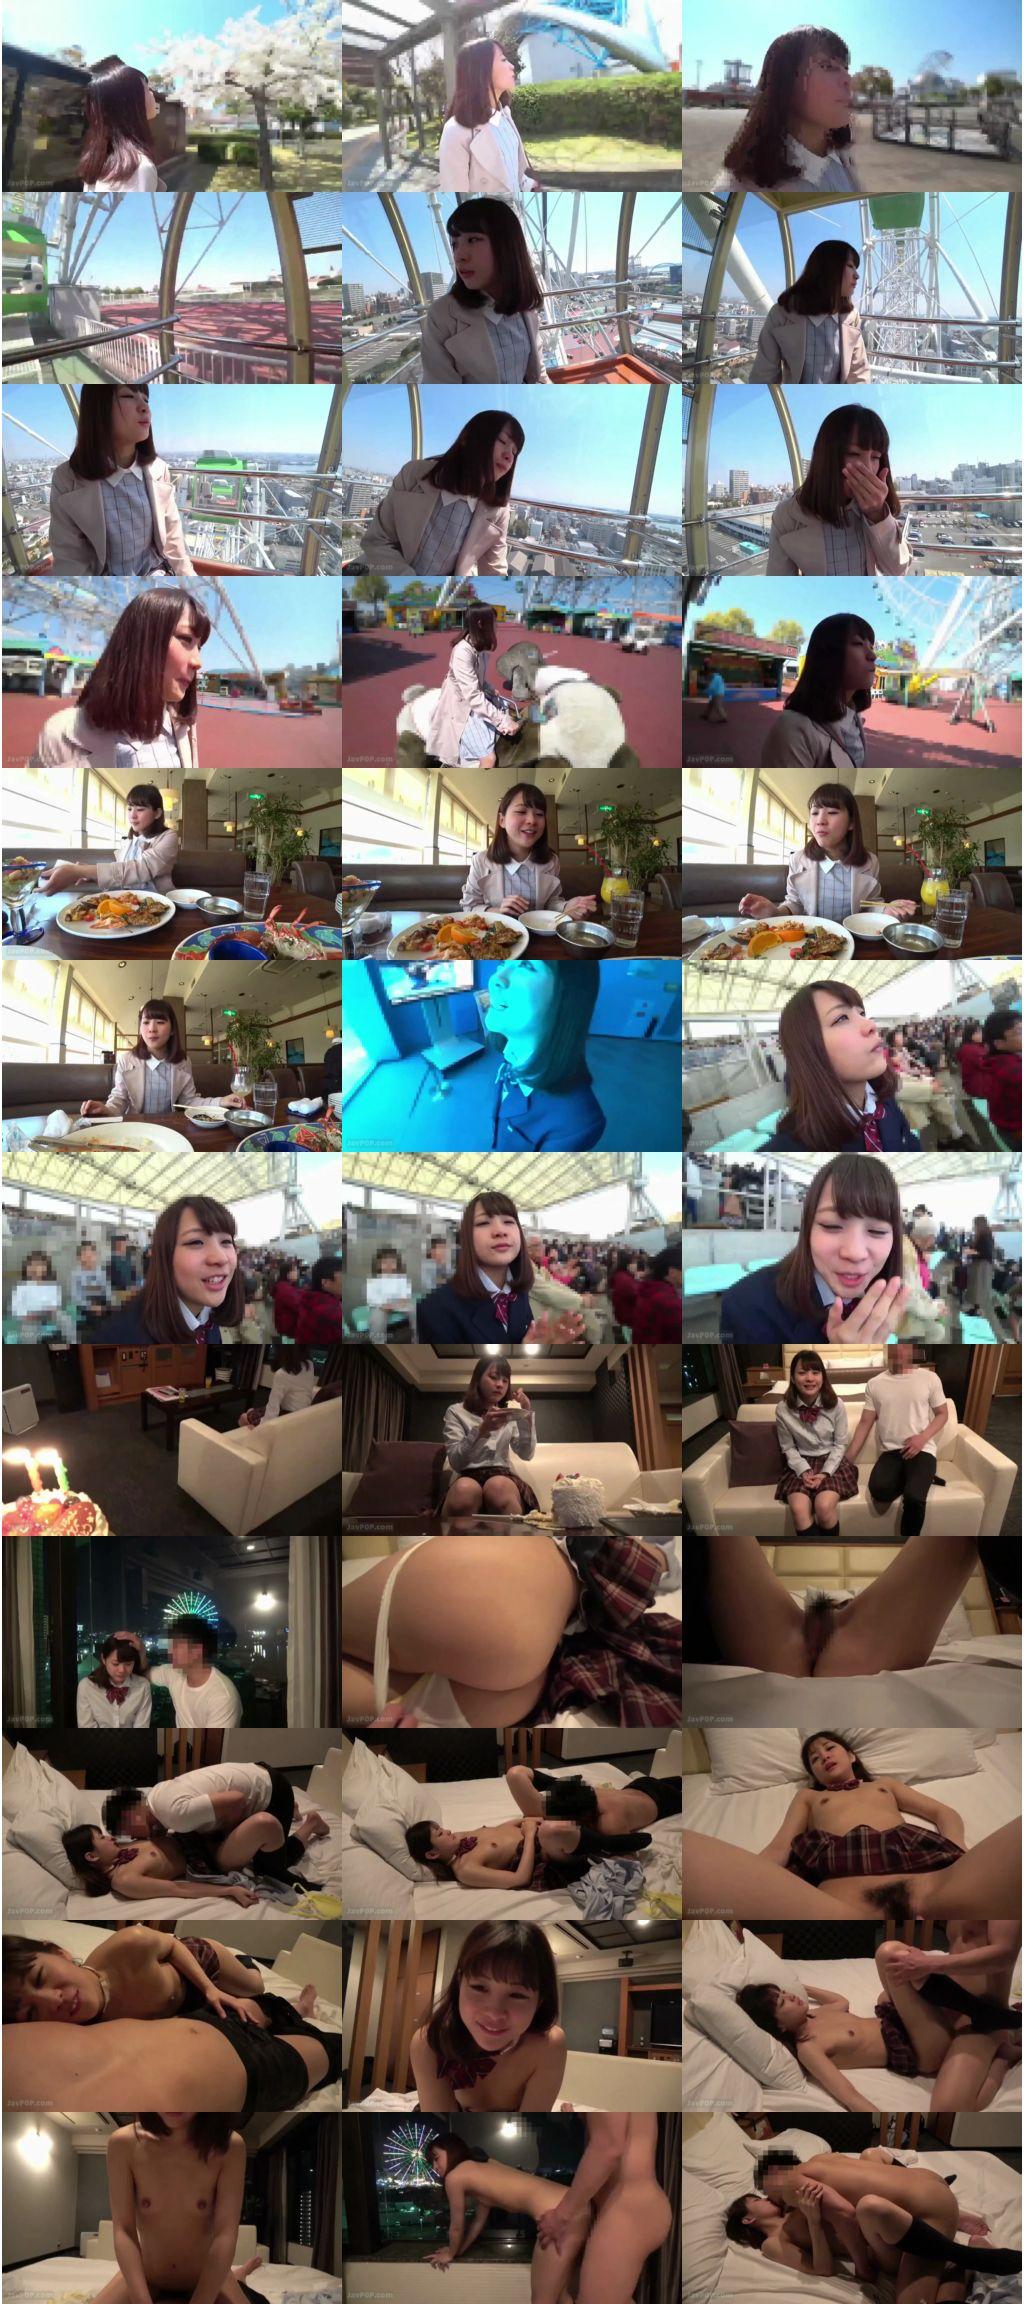 [FC2_PPV-1066447] 【絶対的美少女】地下アイドルと18才の誕生日前日に思い出の制服デート。2年越しの初Hまでの完全ドキュメンタリー映像・・・